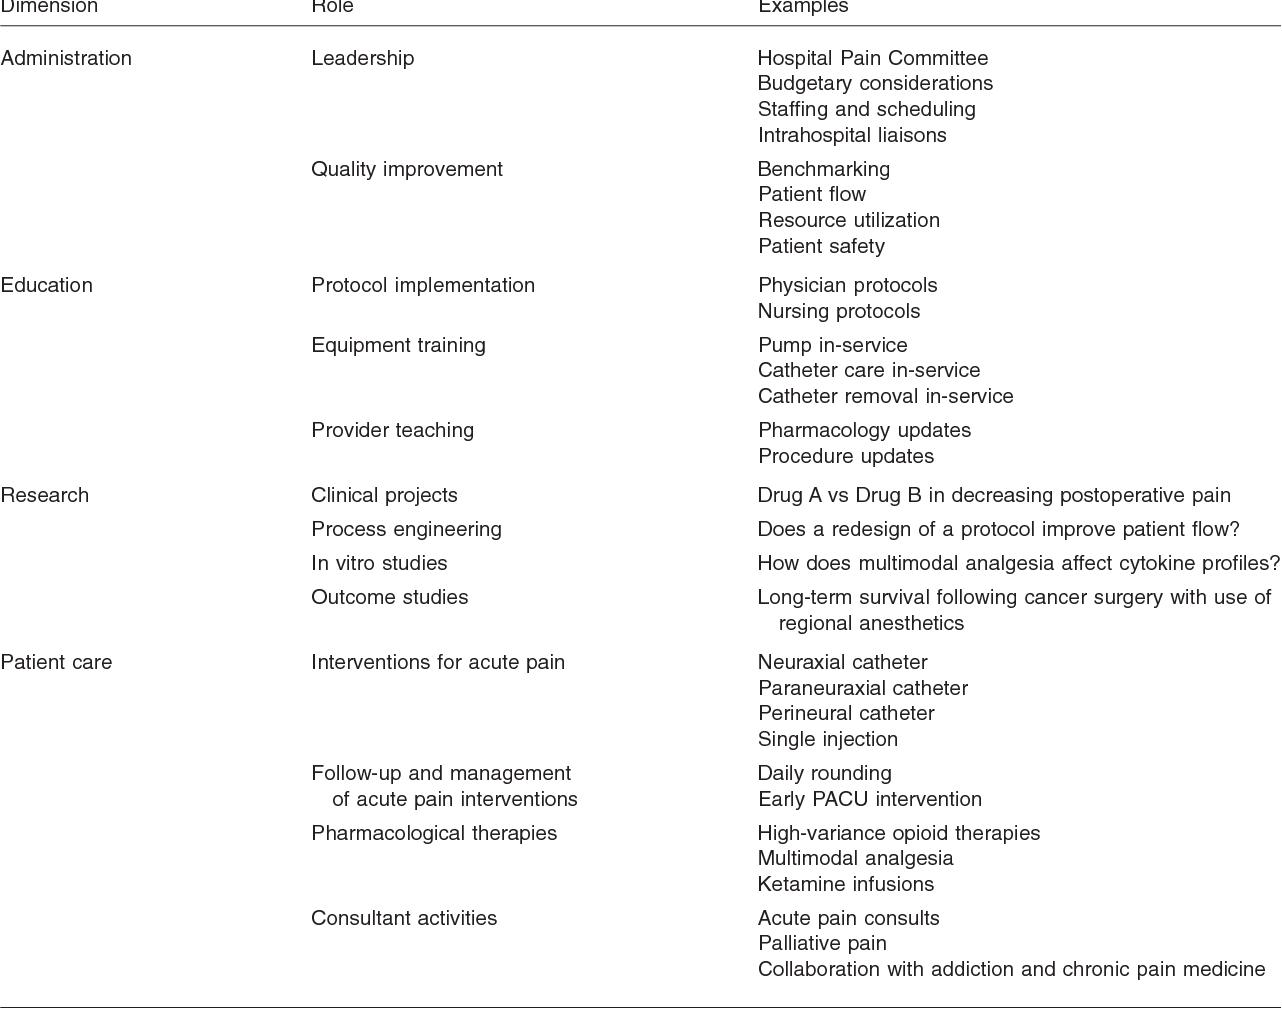 Acute pain care plan. Acute pain nursing diagnosis. 2019-02-08